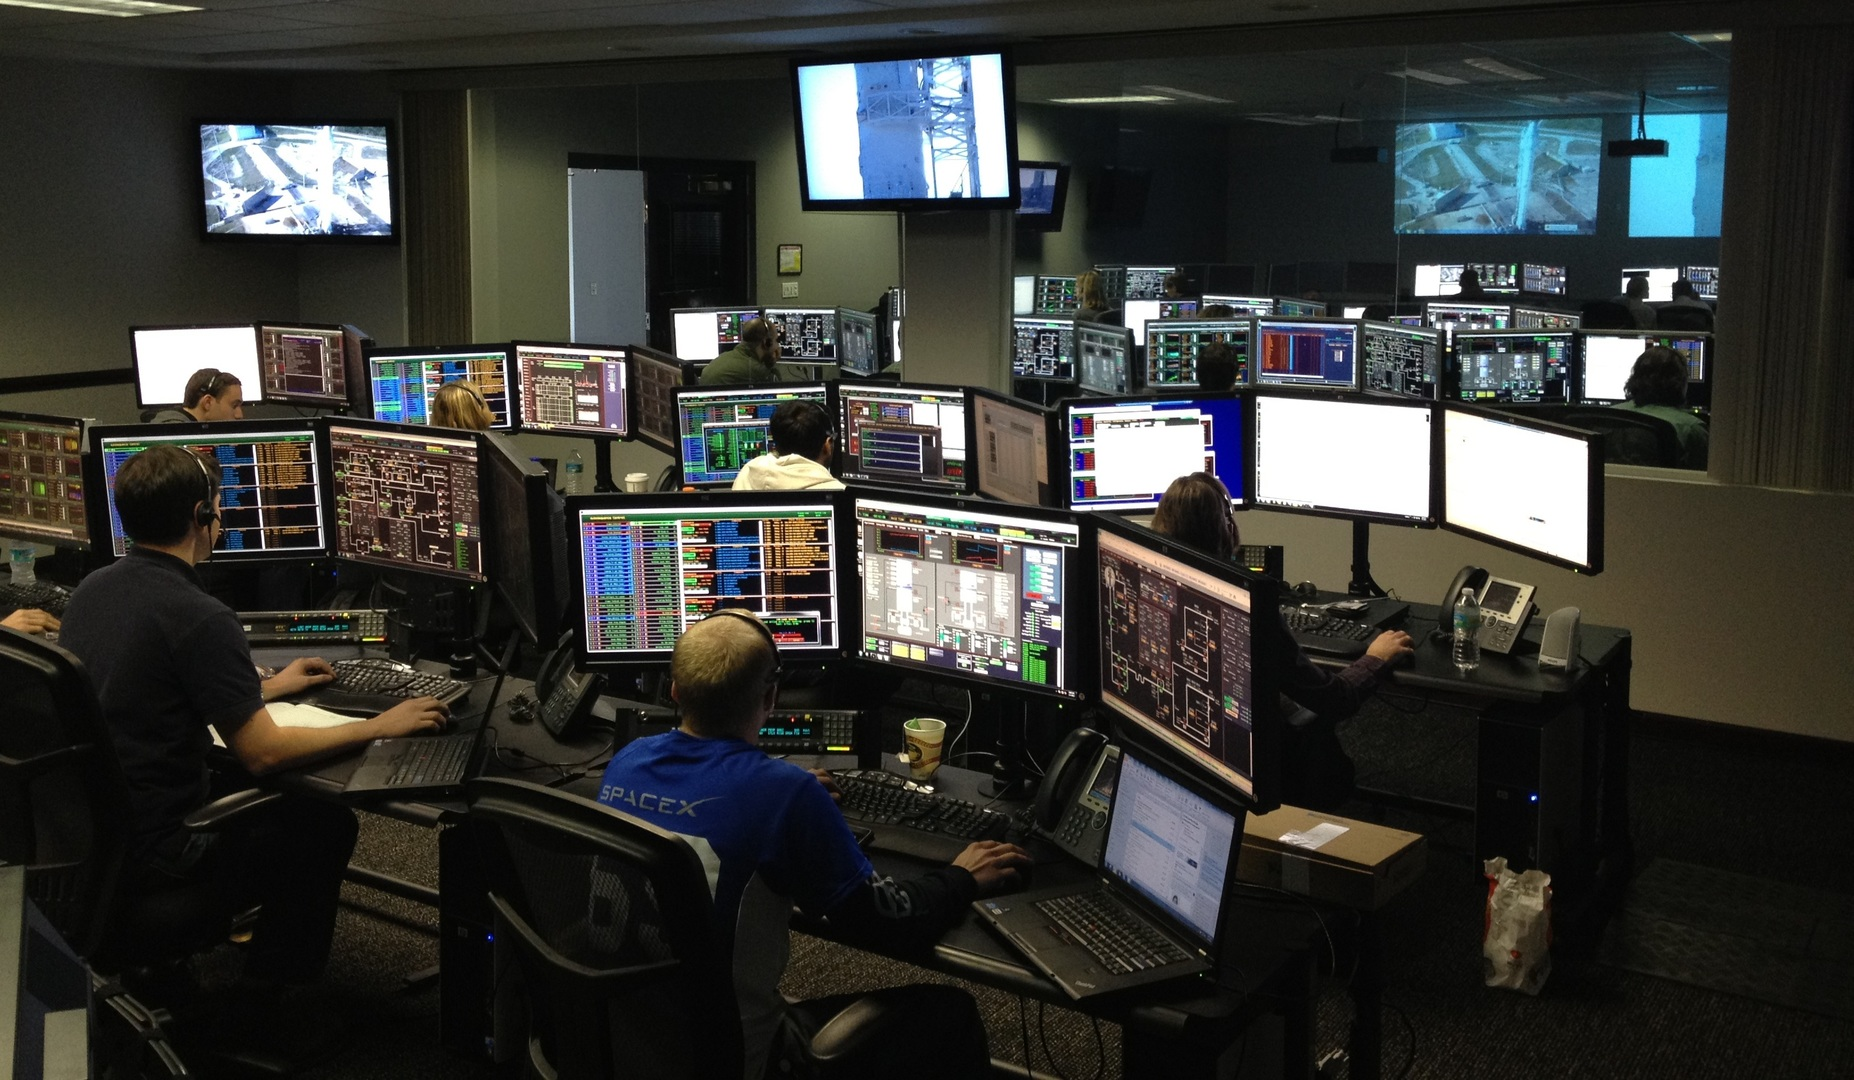 informatyka, komputery, elektronika, technika